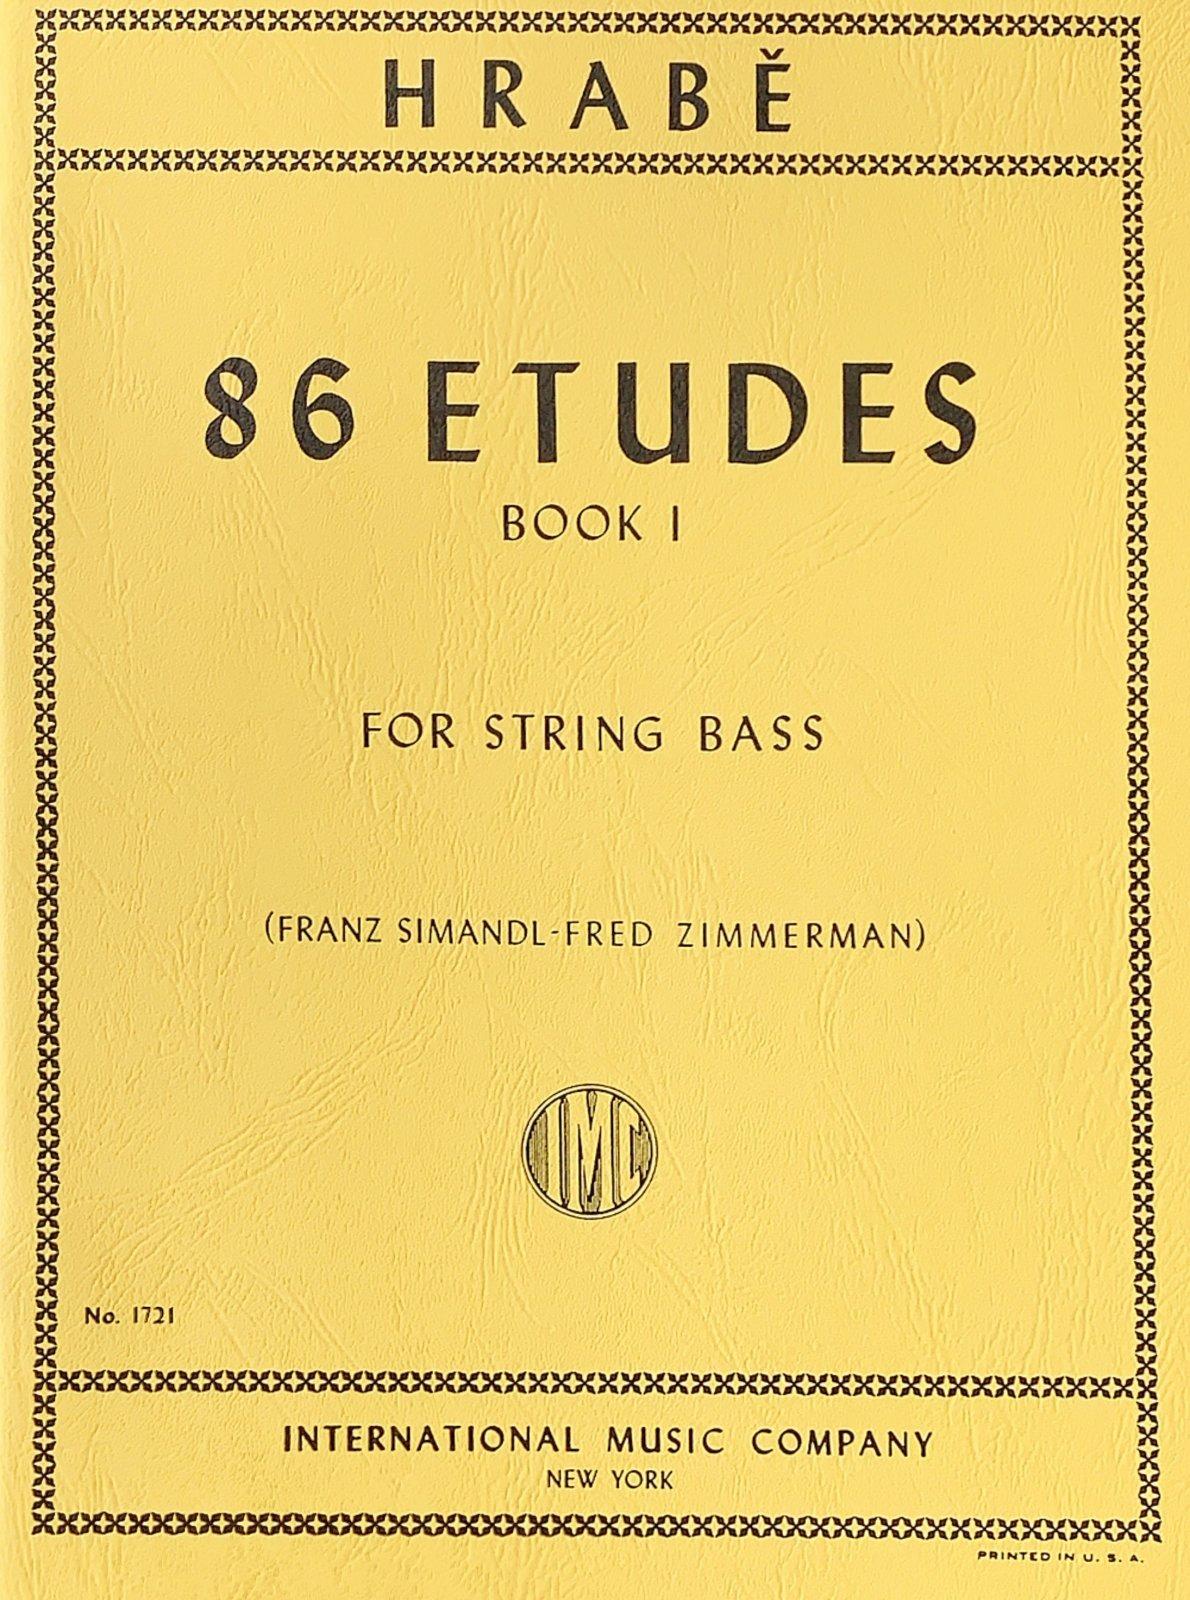 86 Etudes Book 1 - Hrabe - Bass - Zimmerman - International